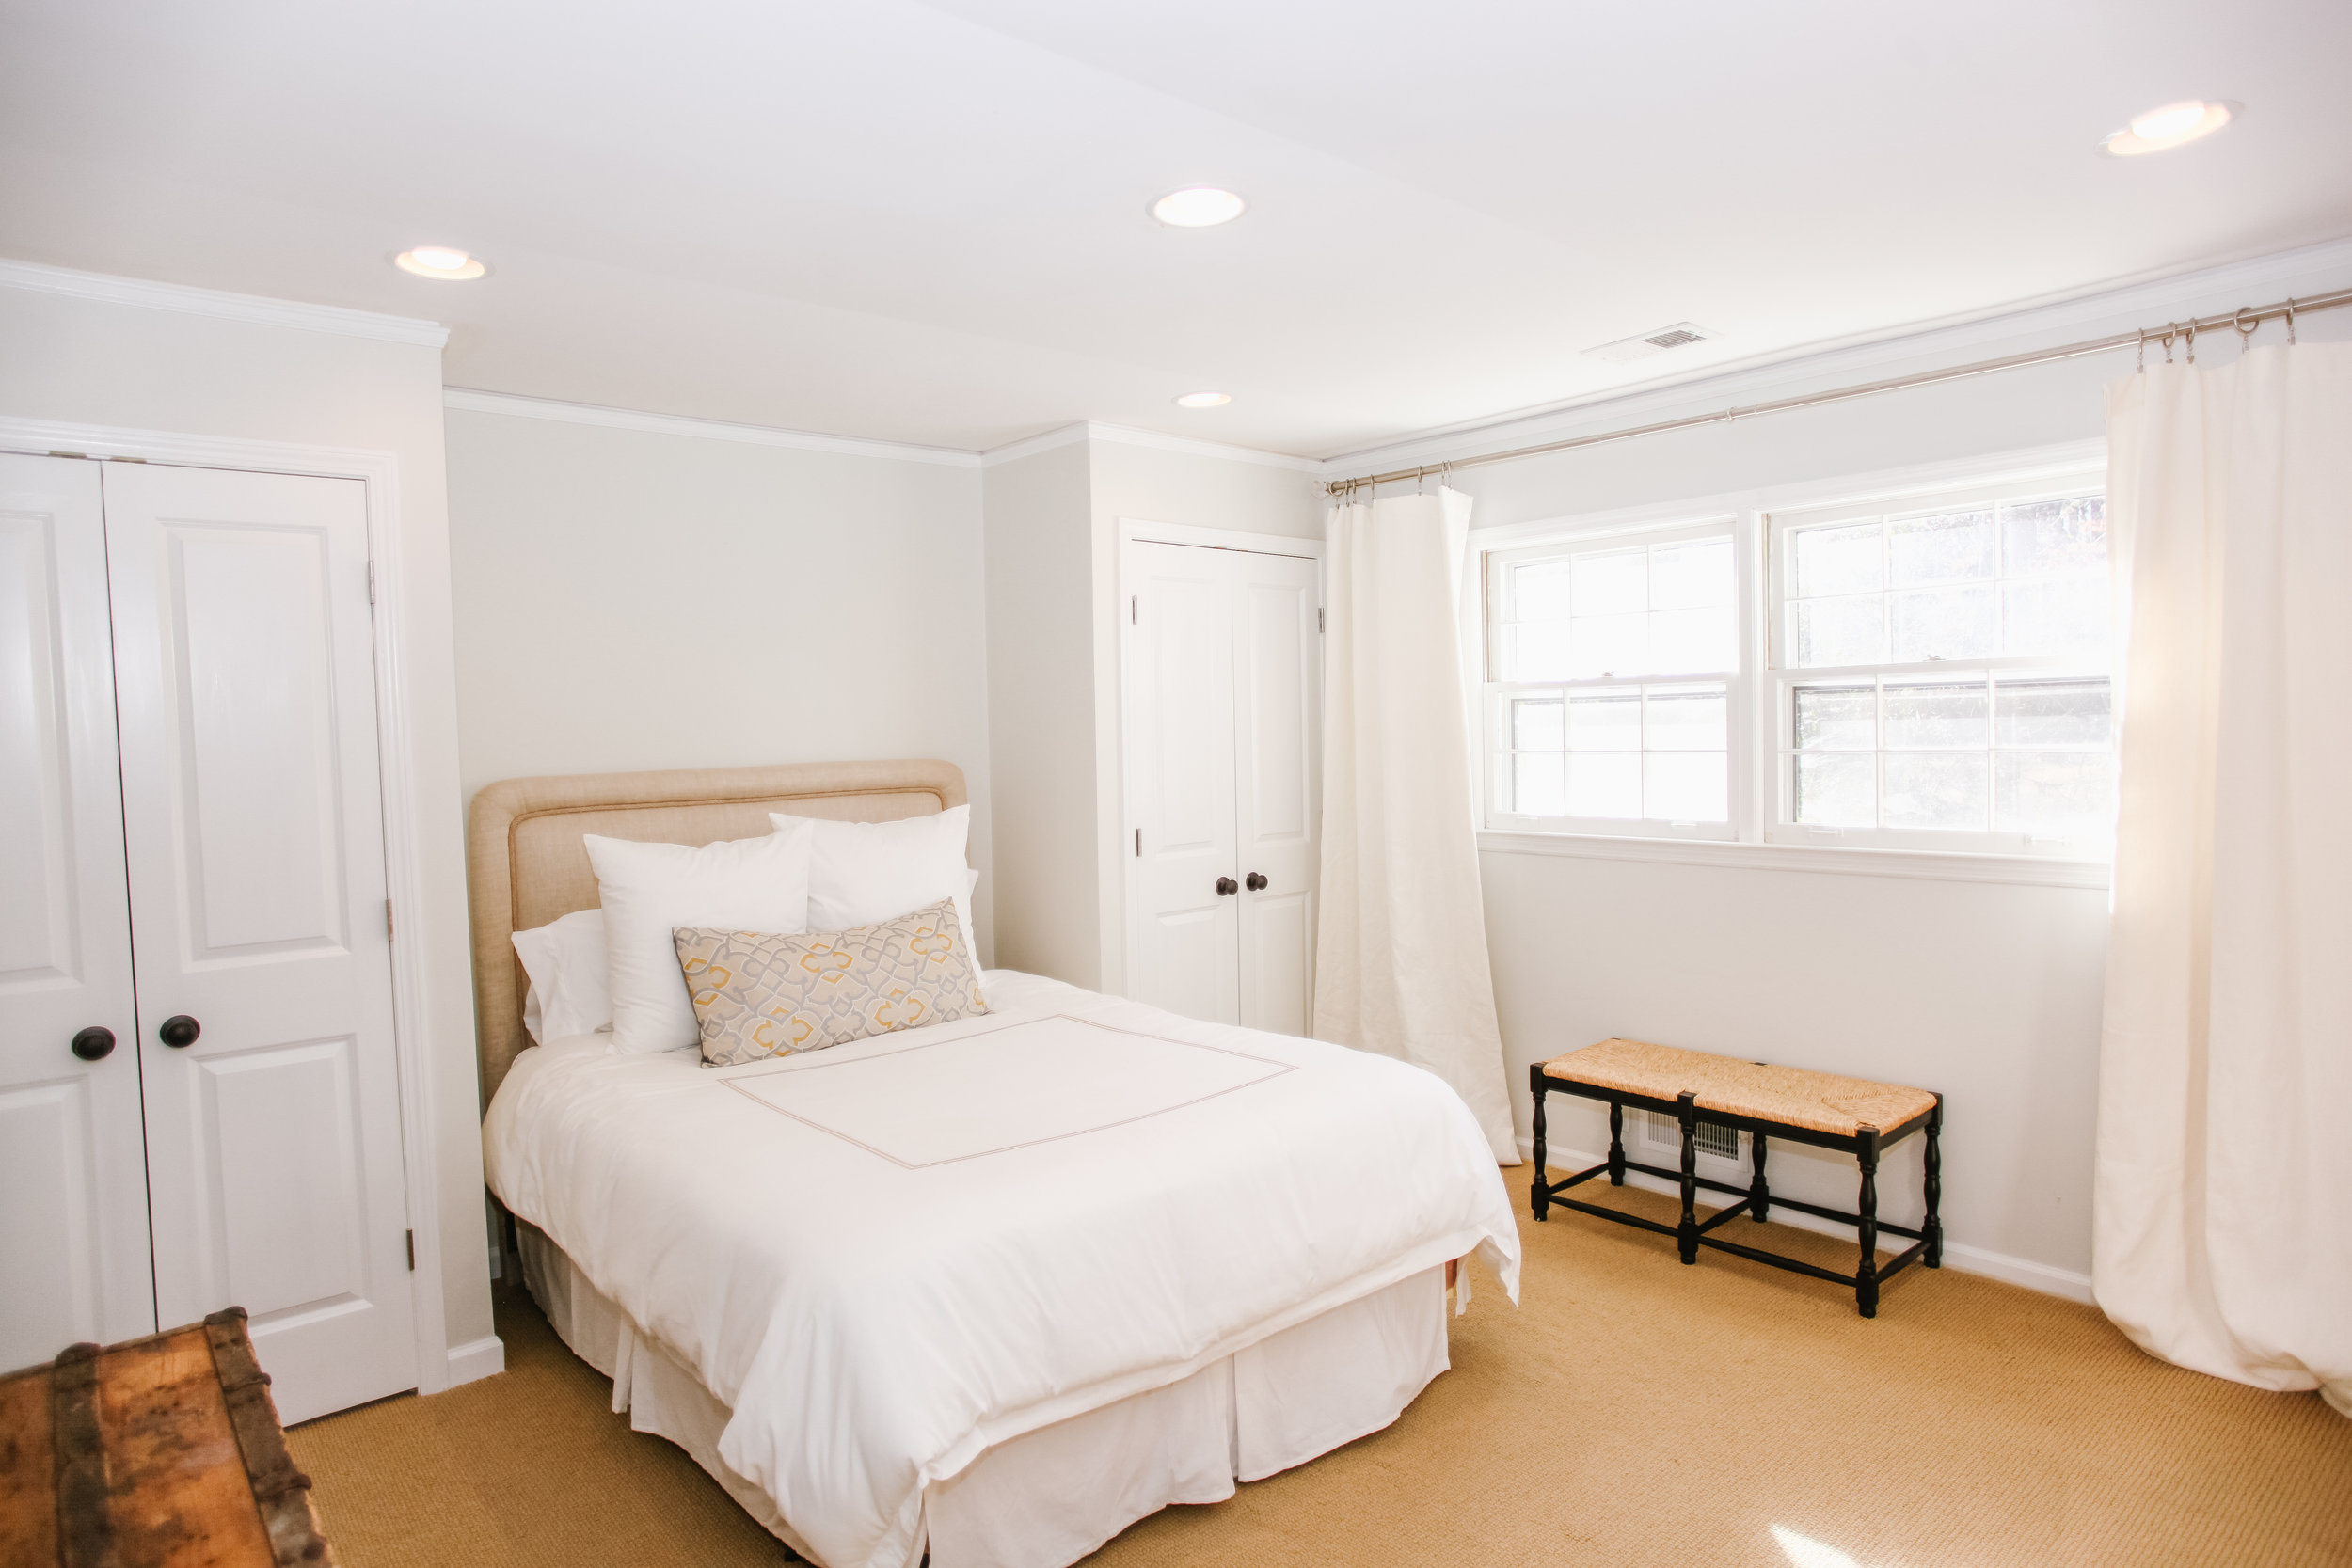 wingard-real-estate-sandy-springs-dream-home-backyard-goals-atlanta-buckhead-6.jpg